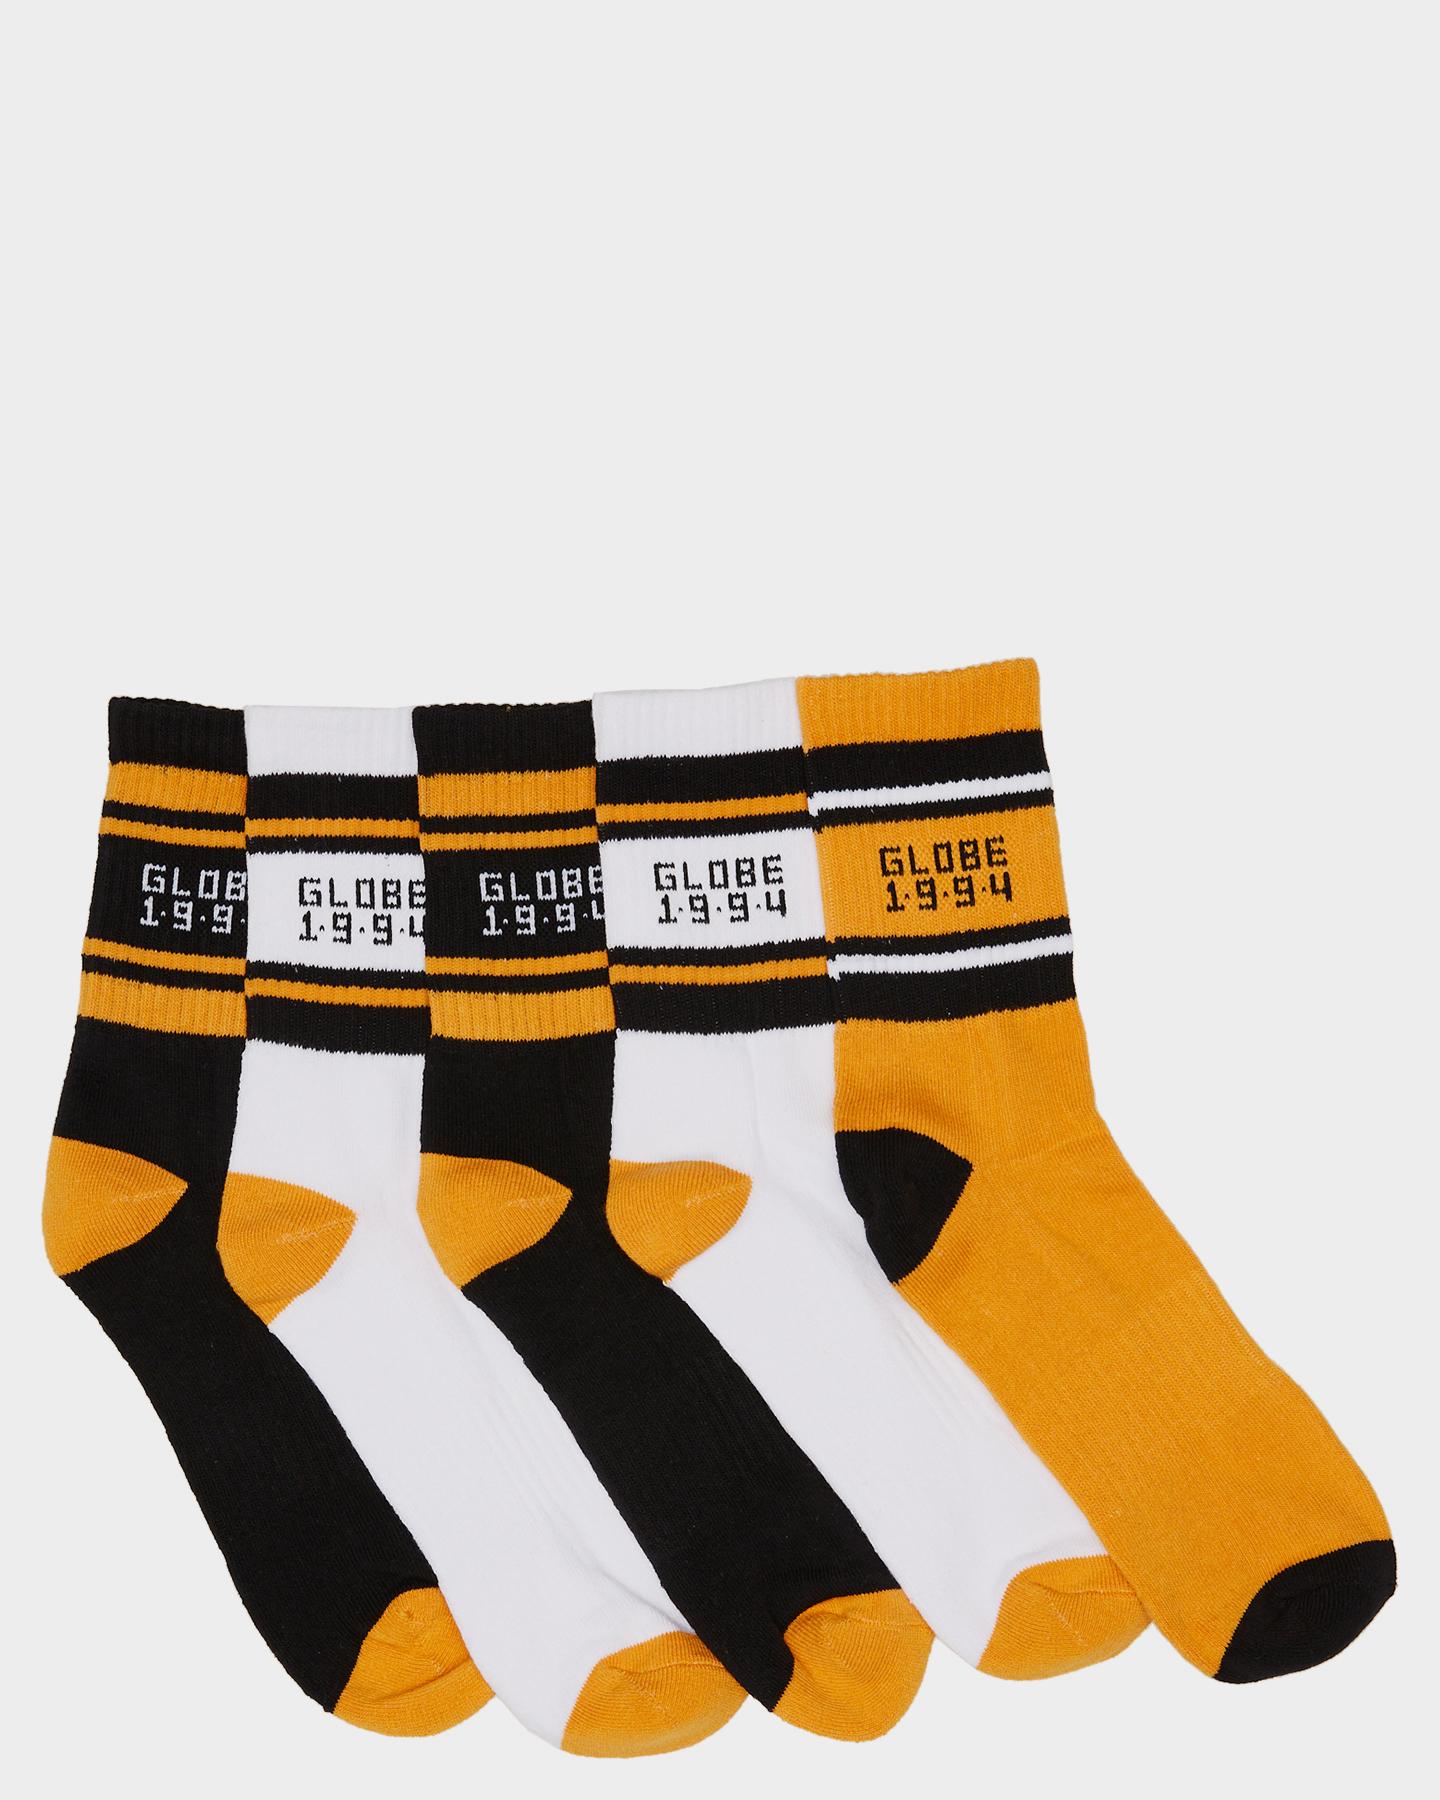 Globe Bengal Crew 5 Pack Socks Gold